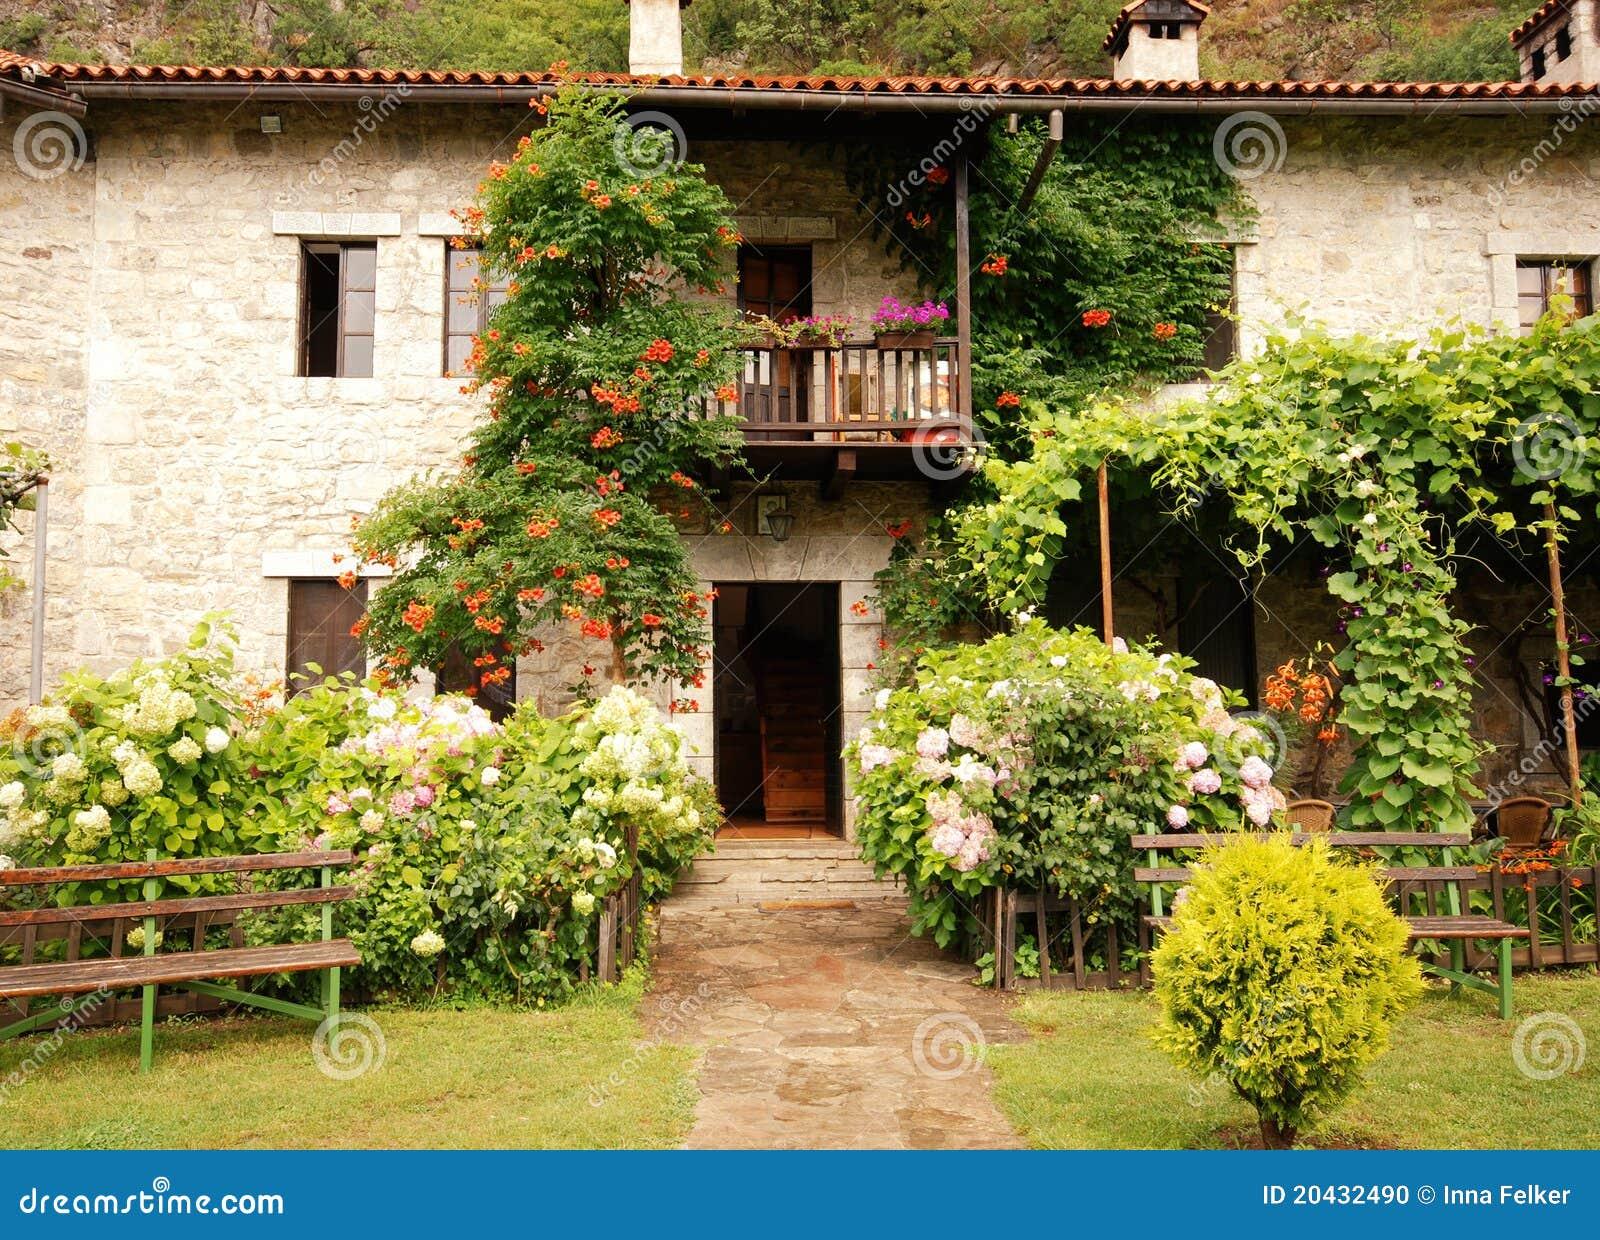 Casa Con Giardino Bovezzo : Casa rurale variopinta con il giardino fotografia stock